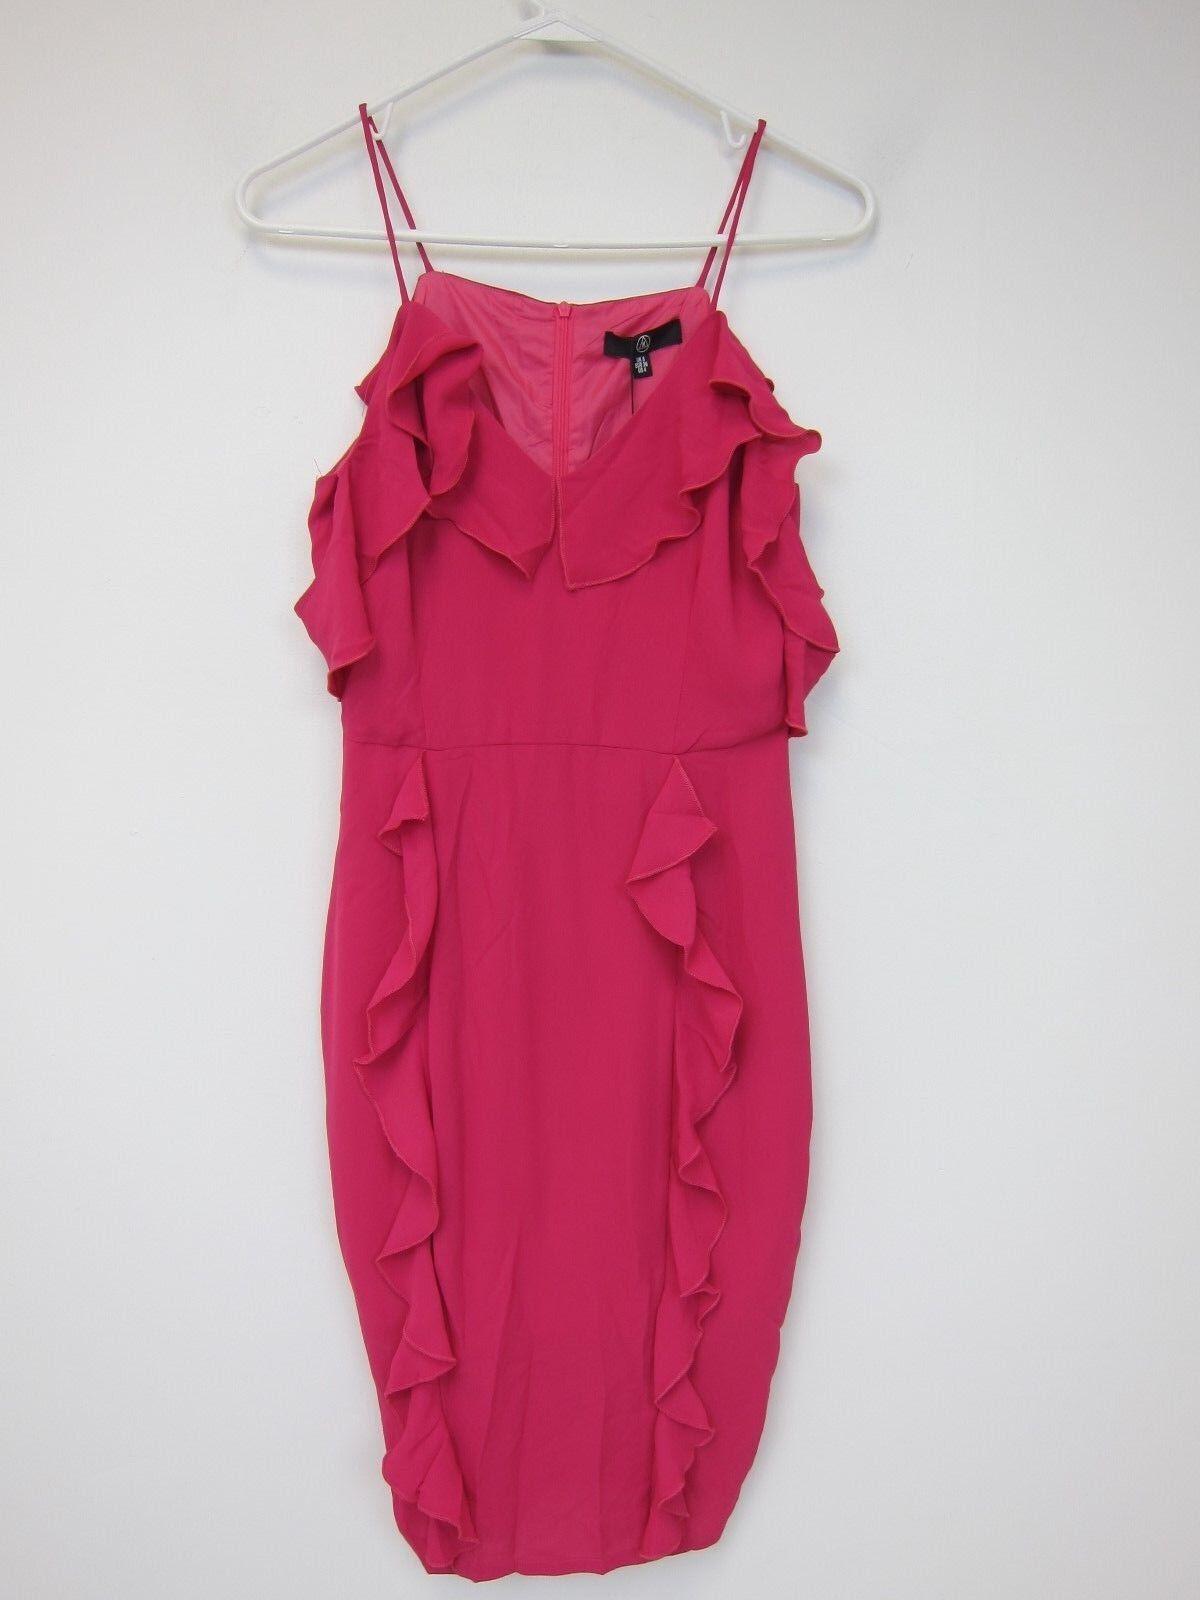 Missguided Frill Cold Shoulder Midi Dress - Womens US 4 - Fuchsia - NWT